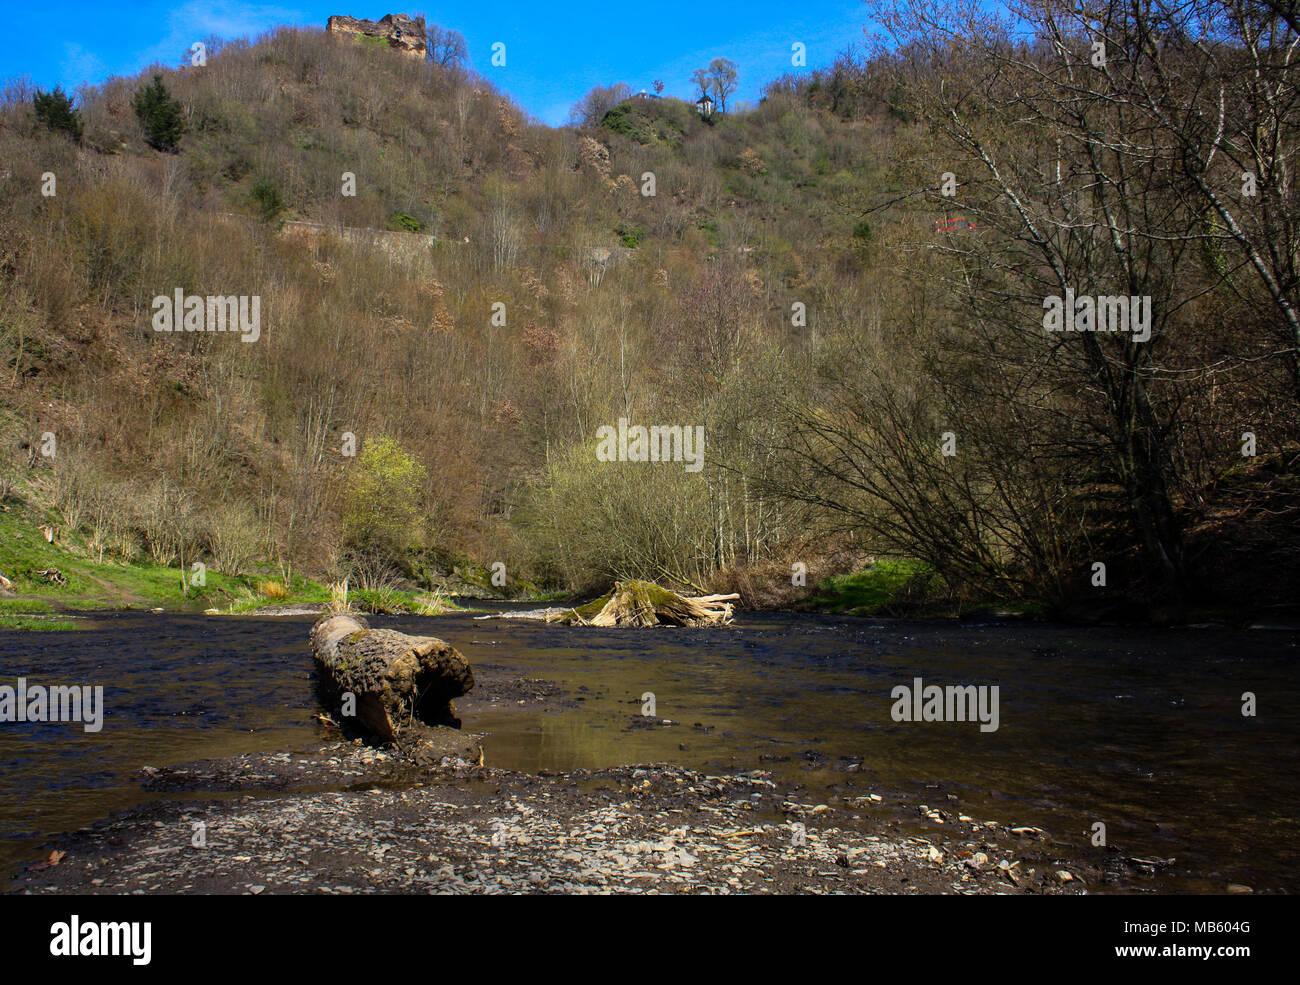 River in Wierschem Germany - Stock Image